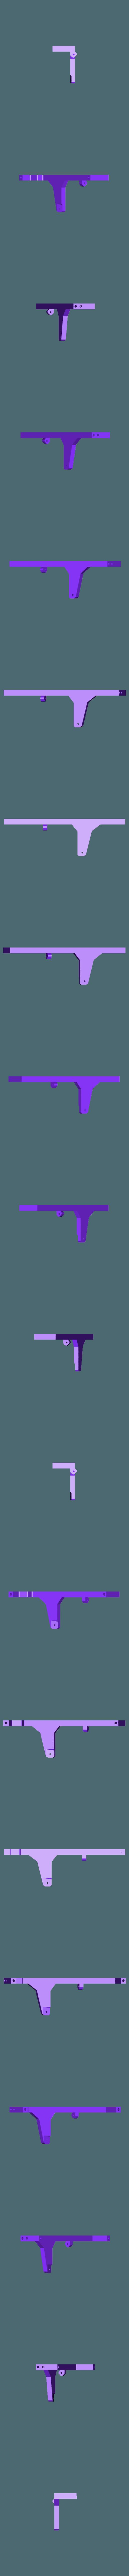 TruckV3_Frontframe1_SplitA.STL Download STL file 3D Printed RC Truck V3 • 3D print model, MrCrankyface